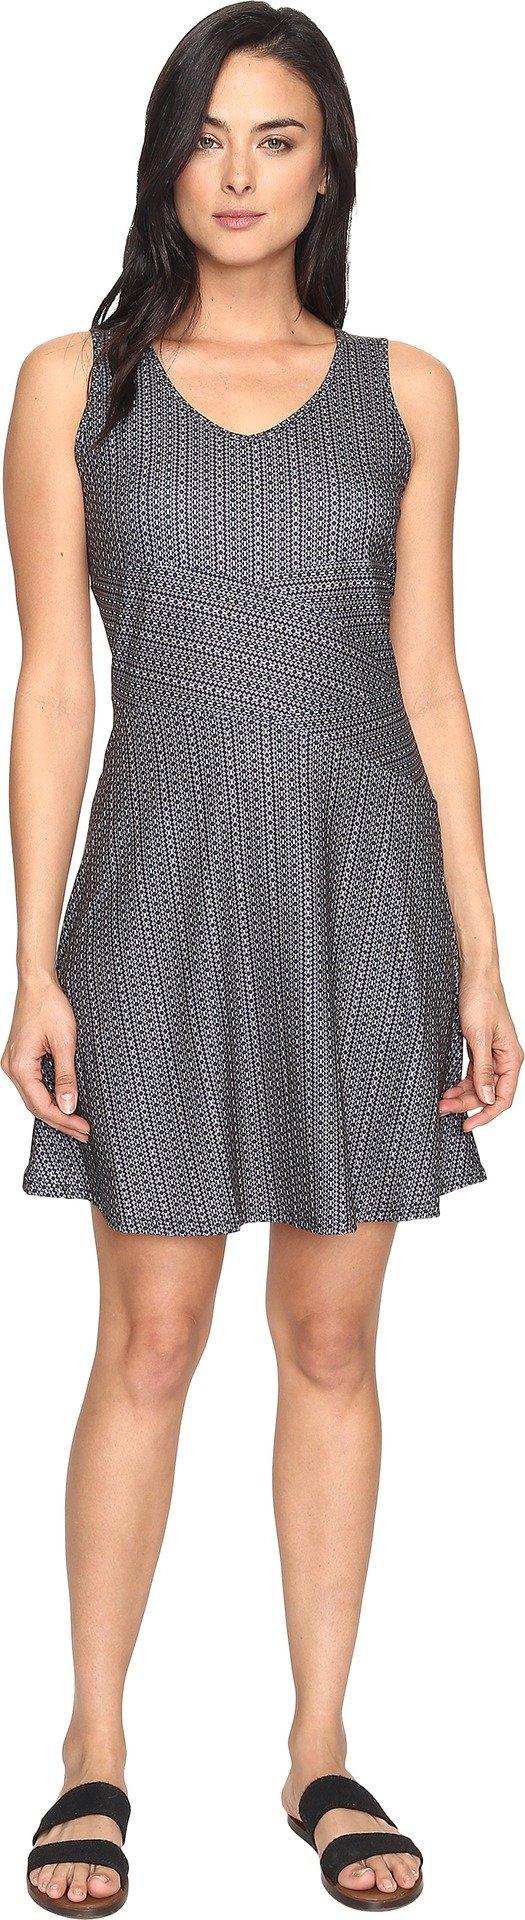 prAna Women's Amelie Dress, Charcoal Parade, Medium